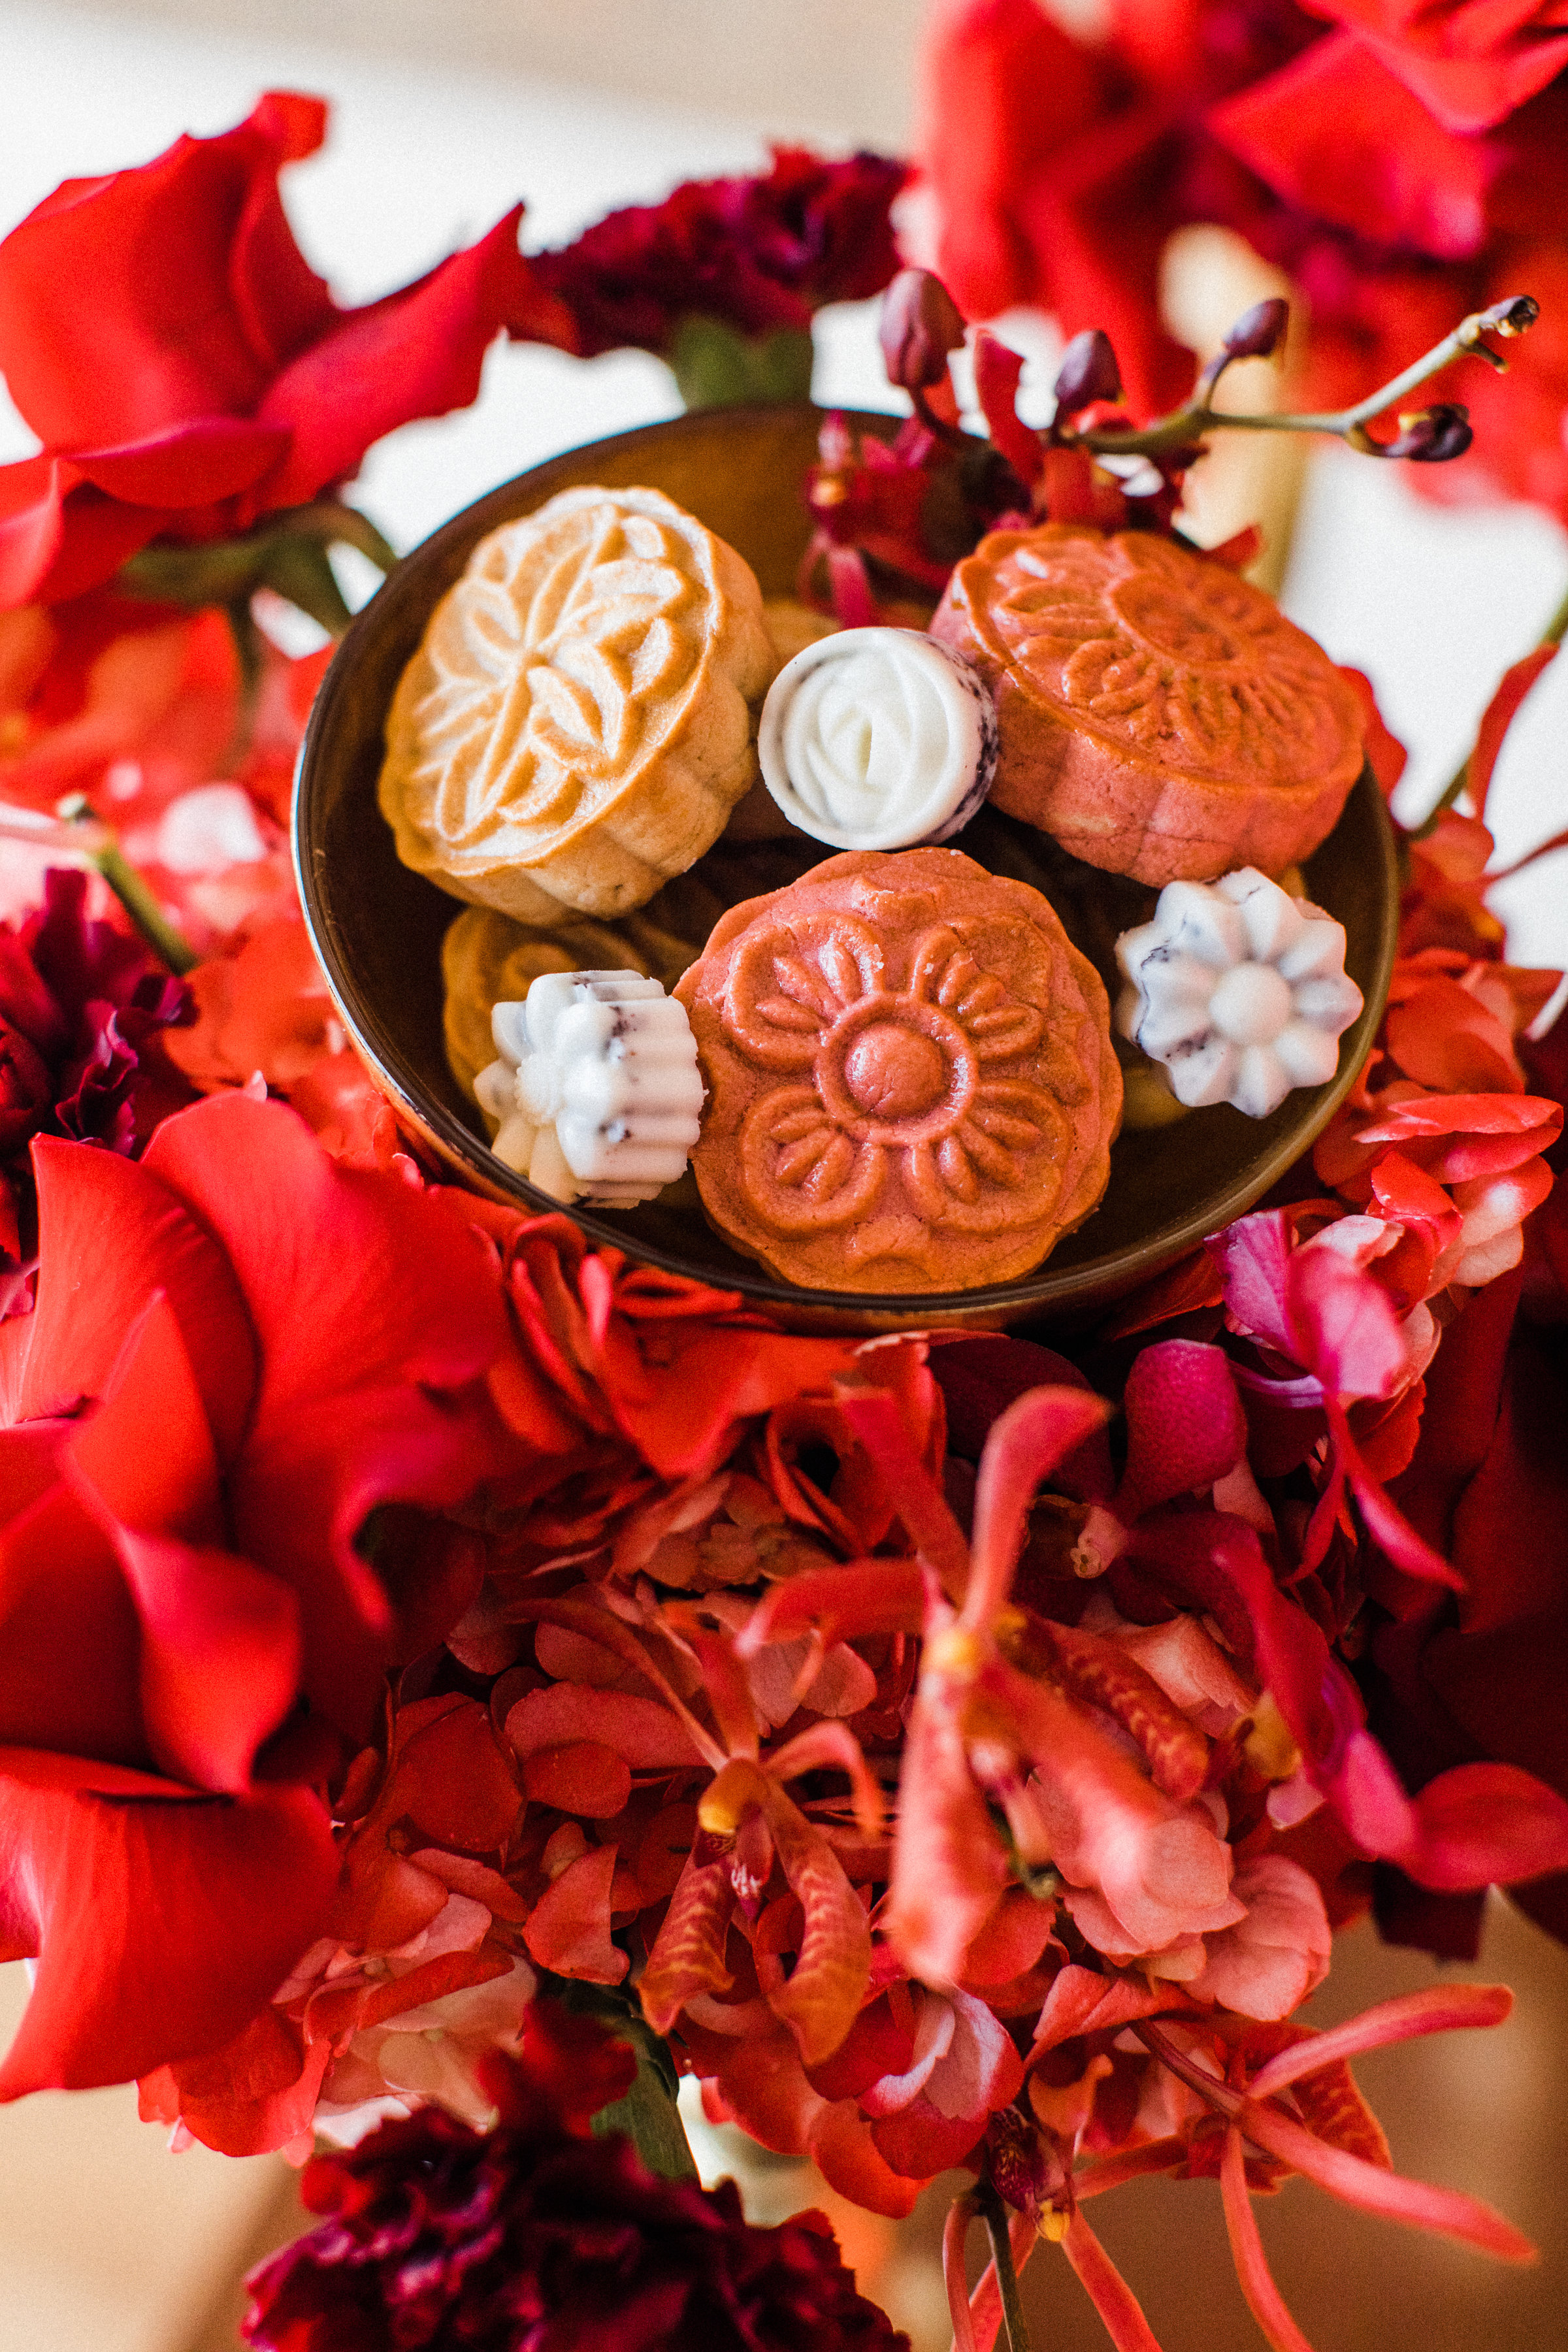 August In Bloom - Desserts - Dessert bowl - Scarlet Sweetheart (Lavish Dulhan)